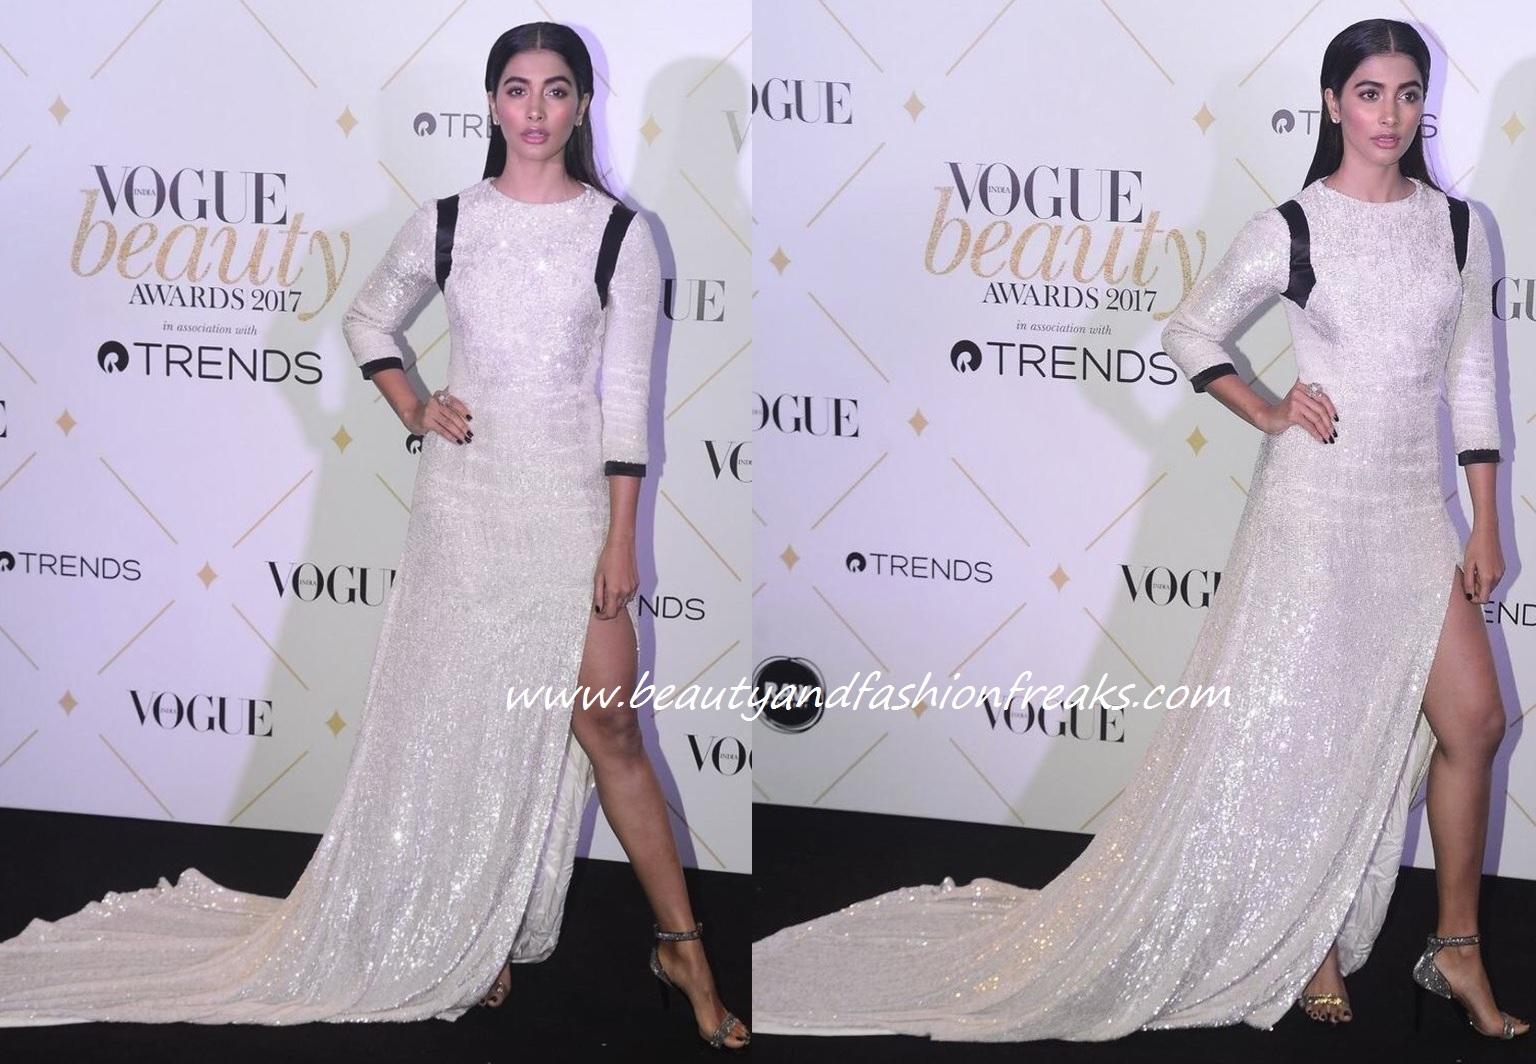 Fashion Beauty Awards: Pooja Hegde In Hasan Hejazi At Vogue Beauty Awards 2017